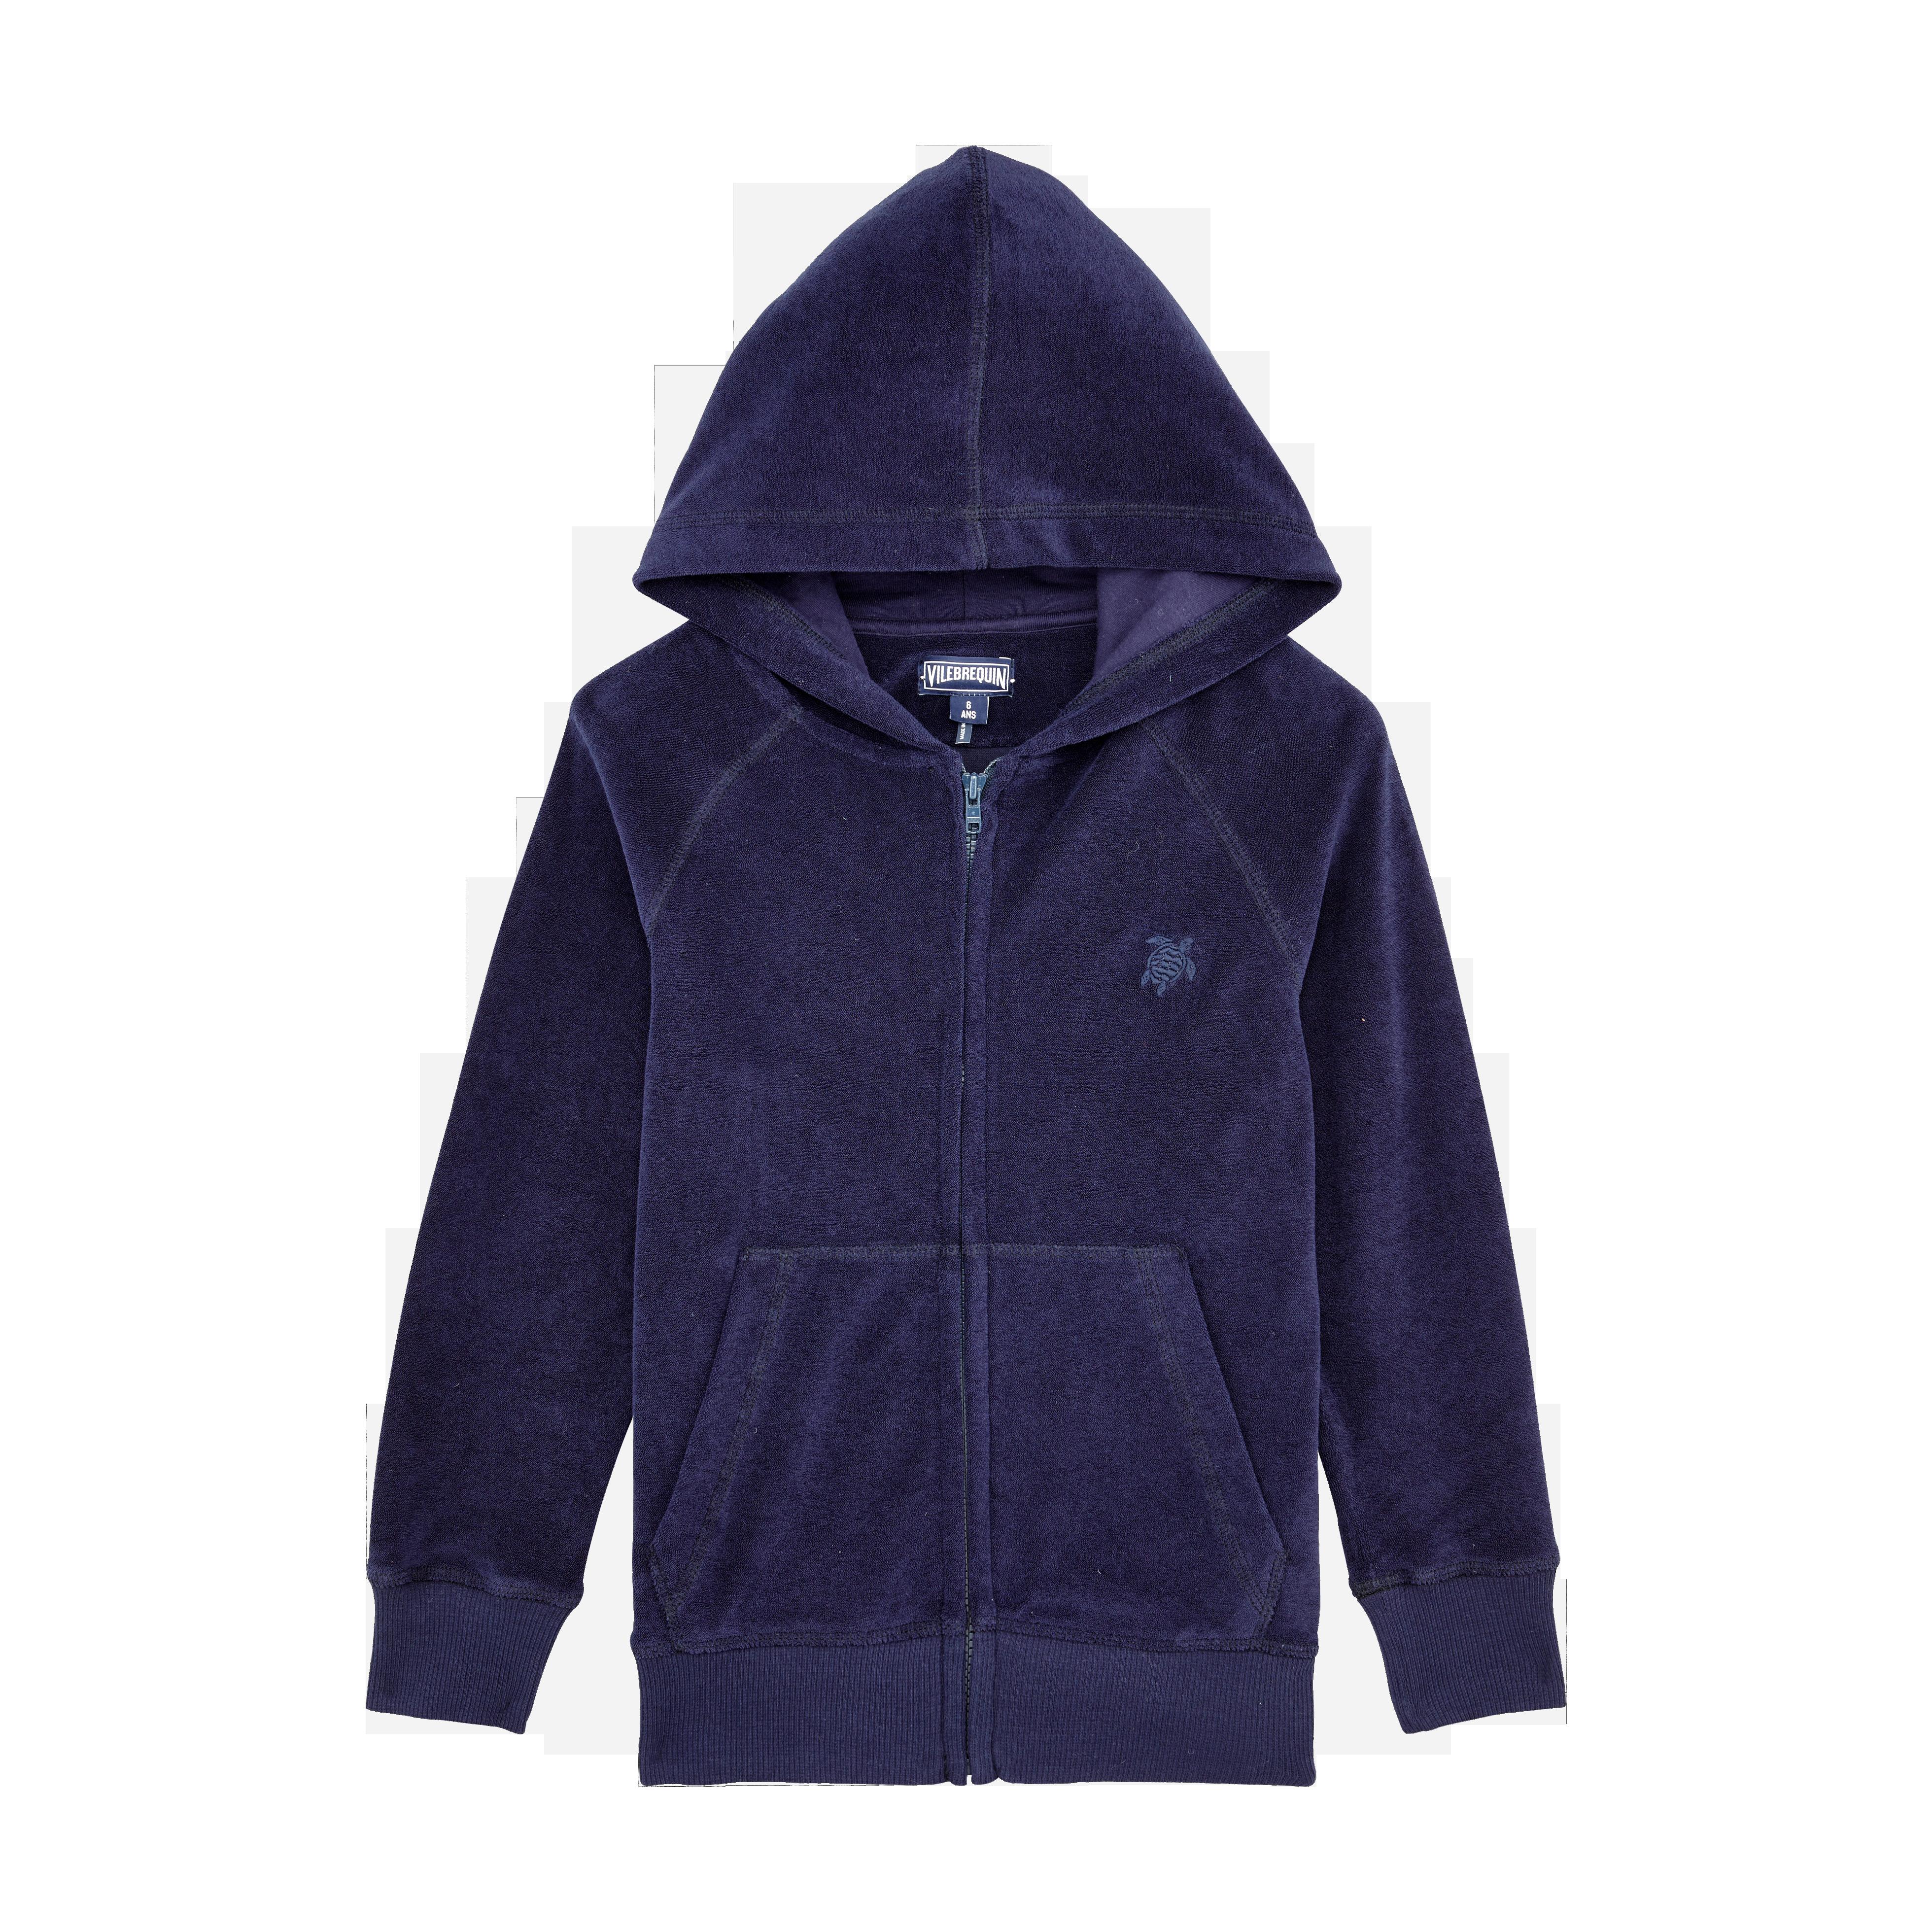 PRET A PORTER GARCON - Sweatshirt à capuche en Eponge Garçon Uni - SWEAT - RYAN - Bleu - 12 - Vilebr